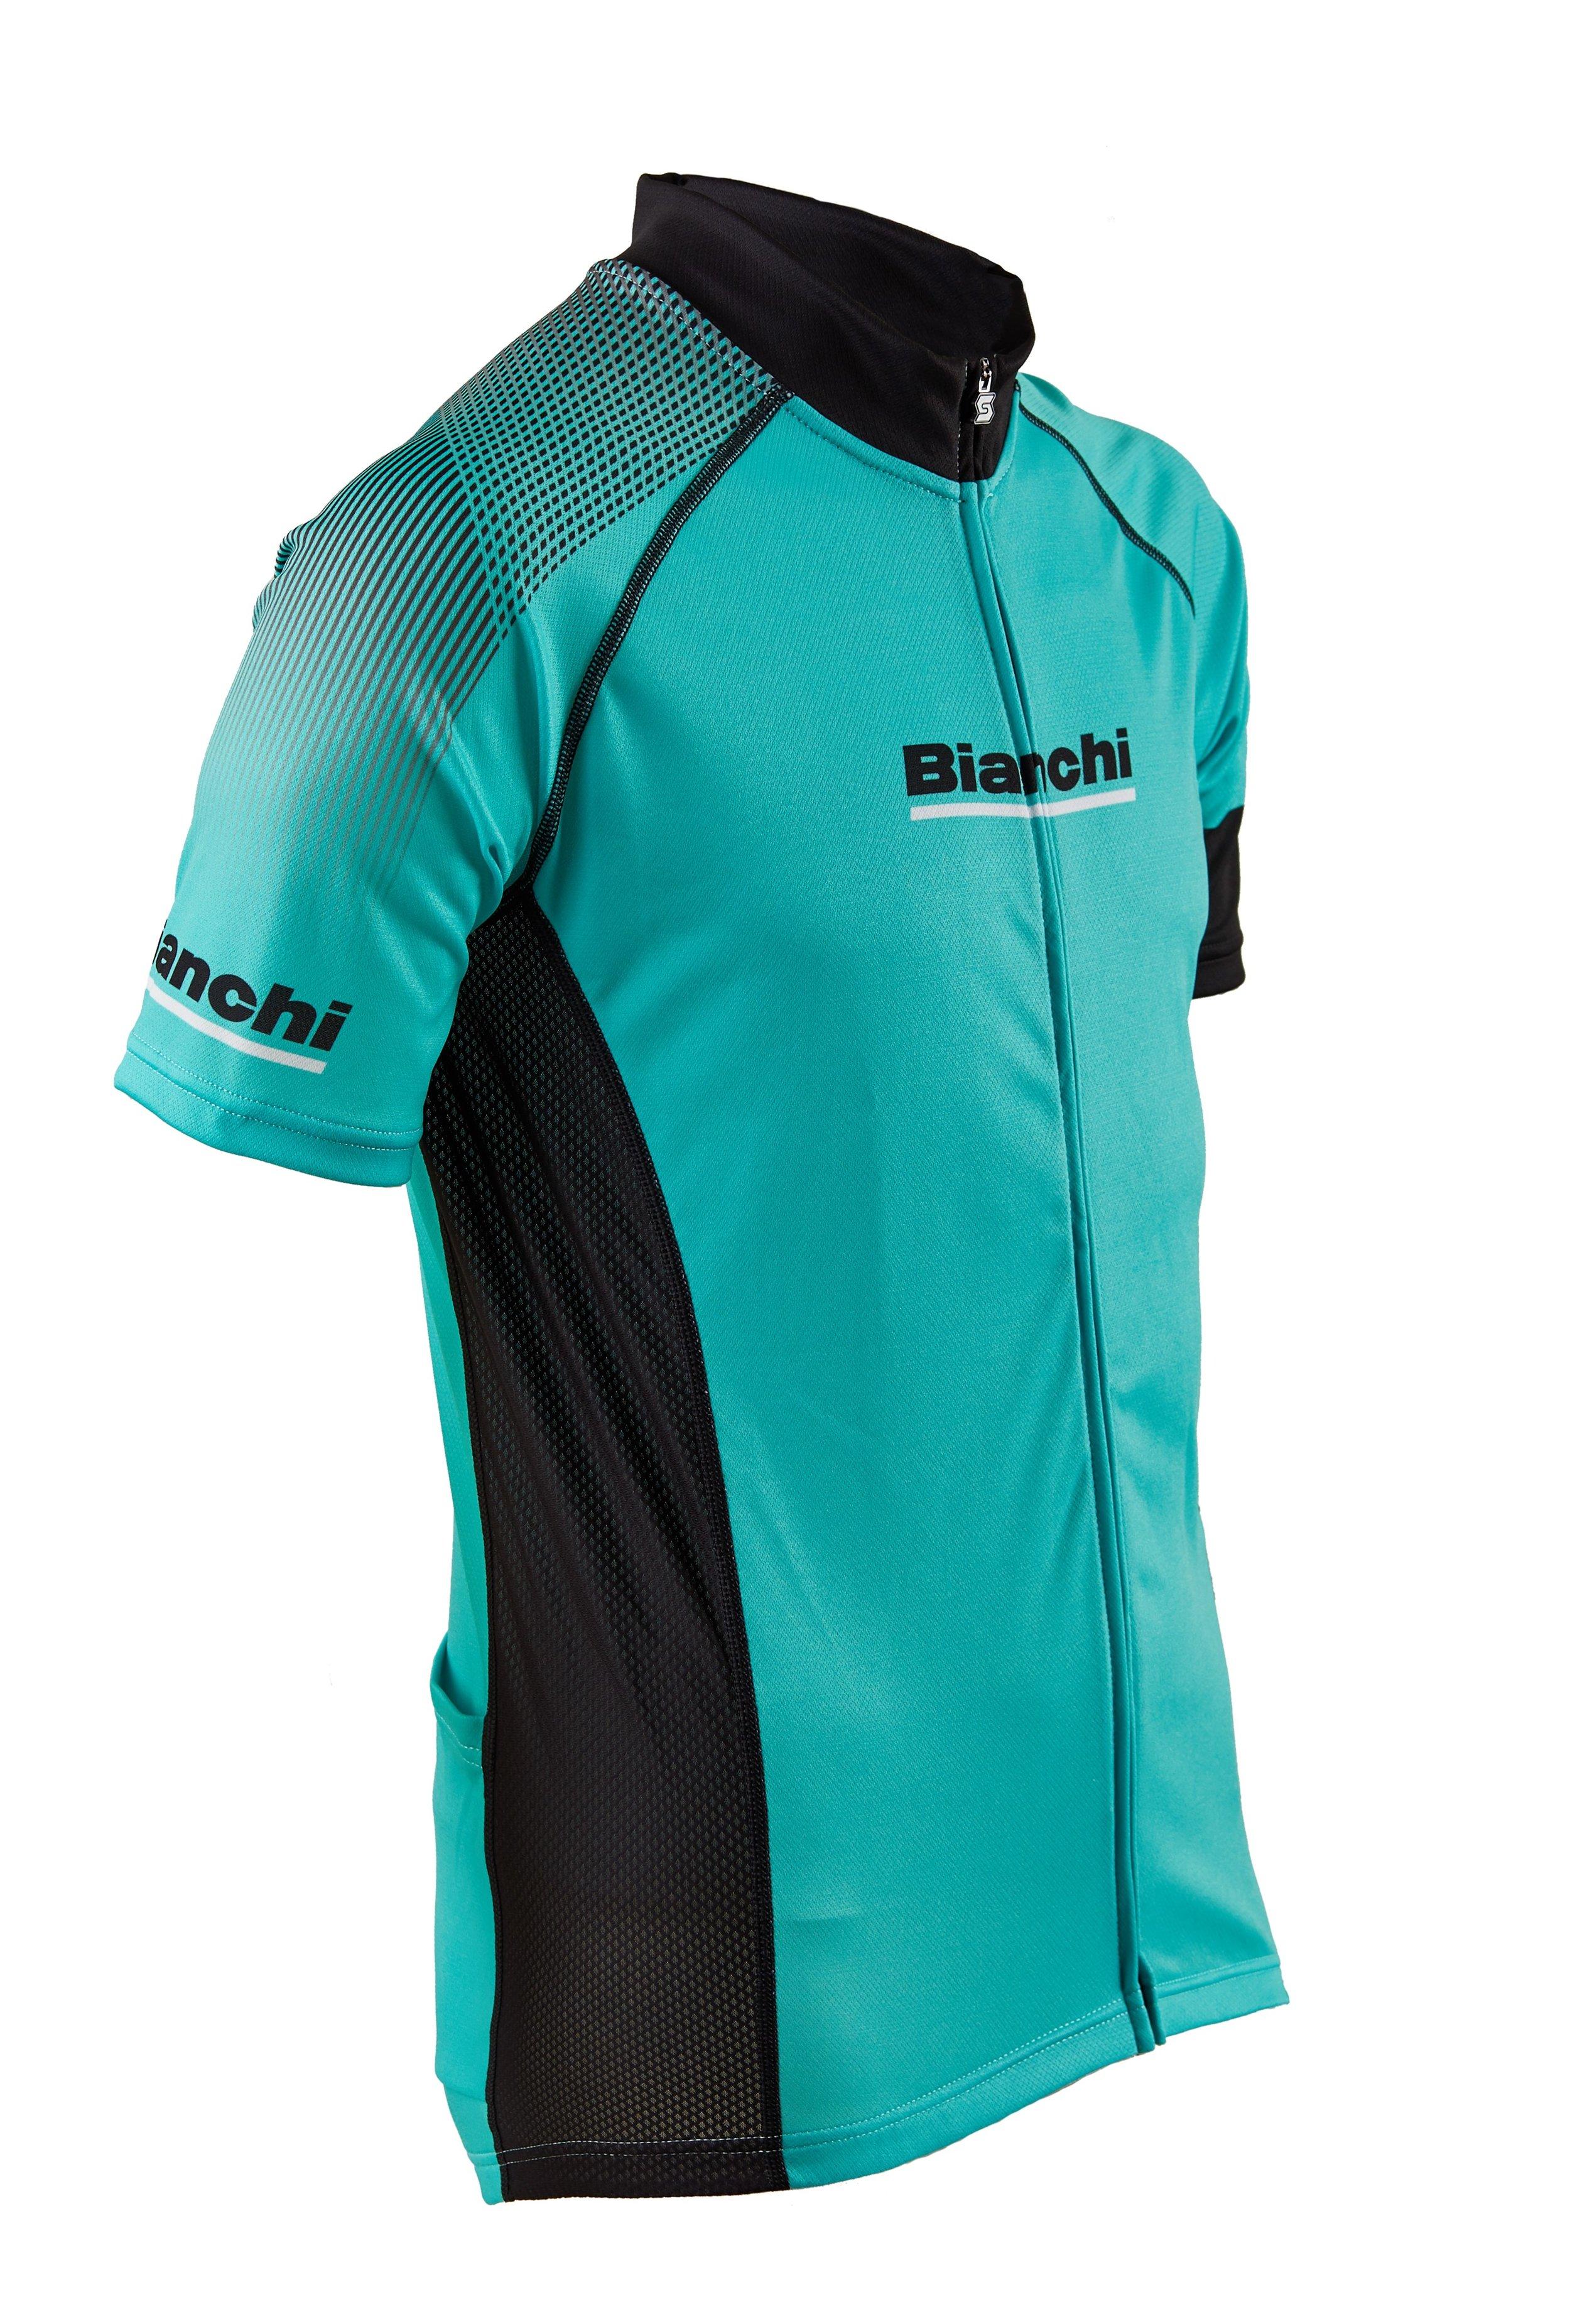 Cycling Bianchi Small Tote Bag